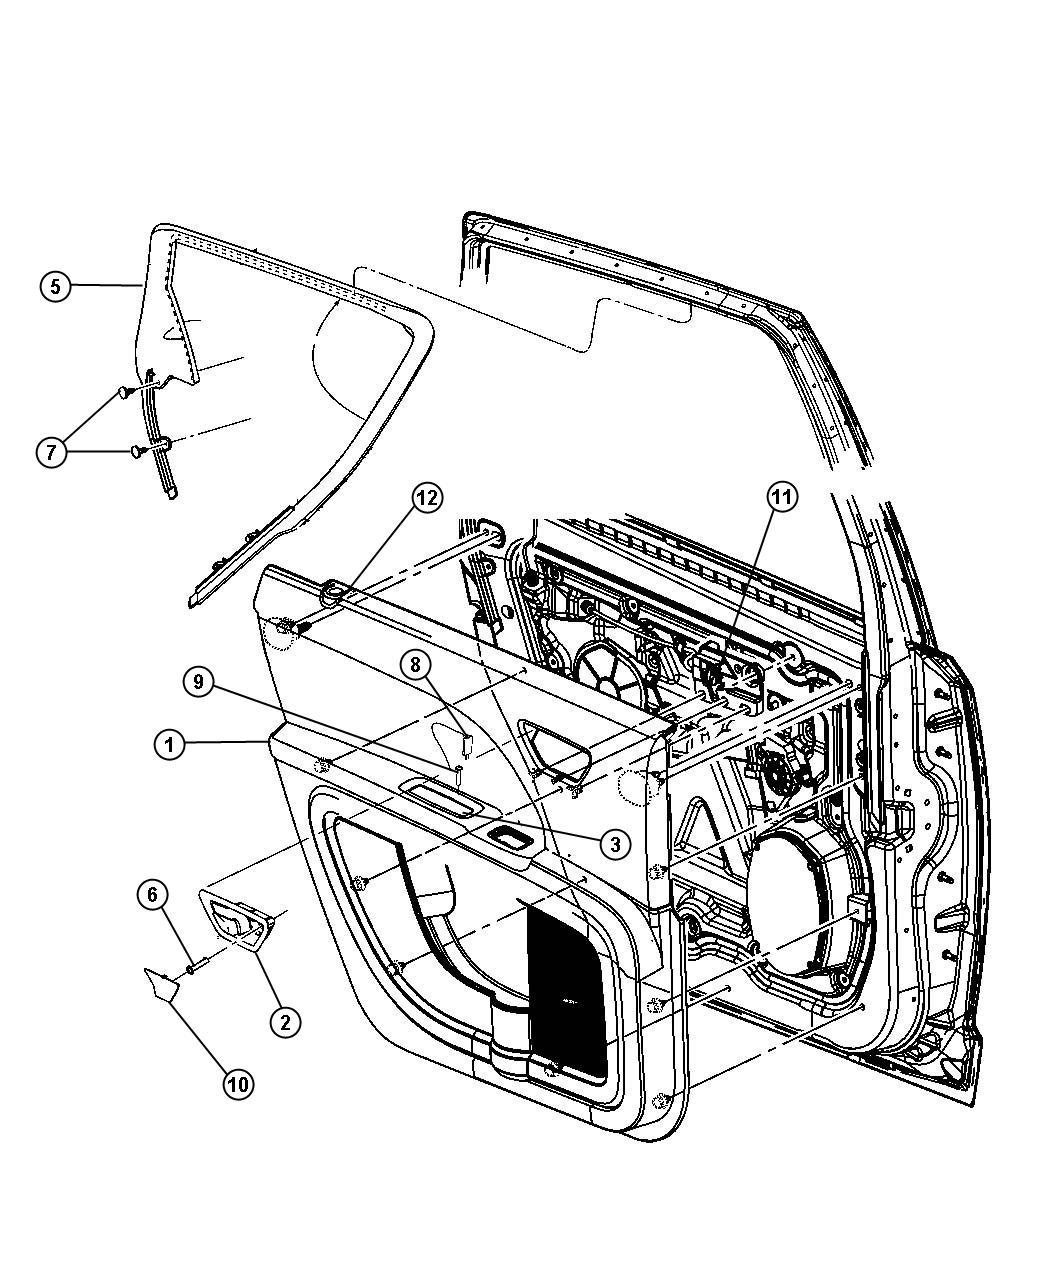 2012 Dodge Journey Grommet. Lock knob. Left, right. Trim